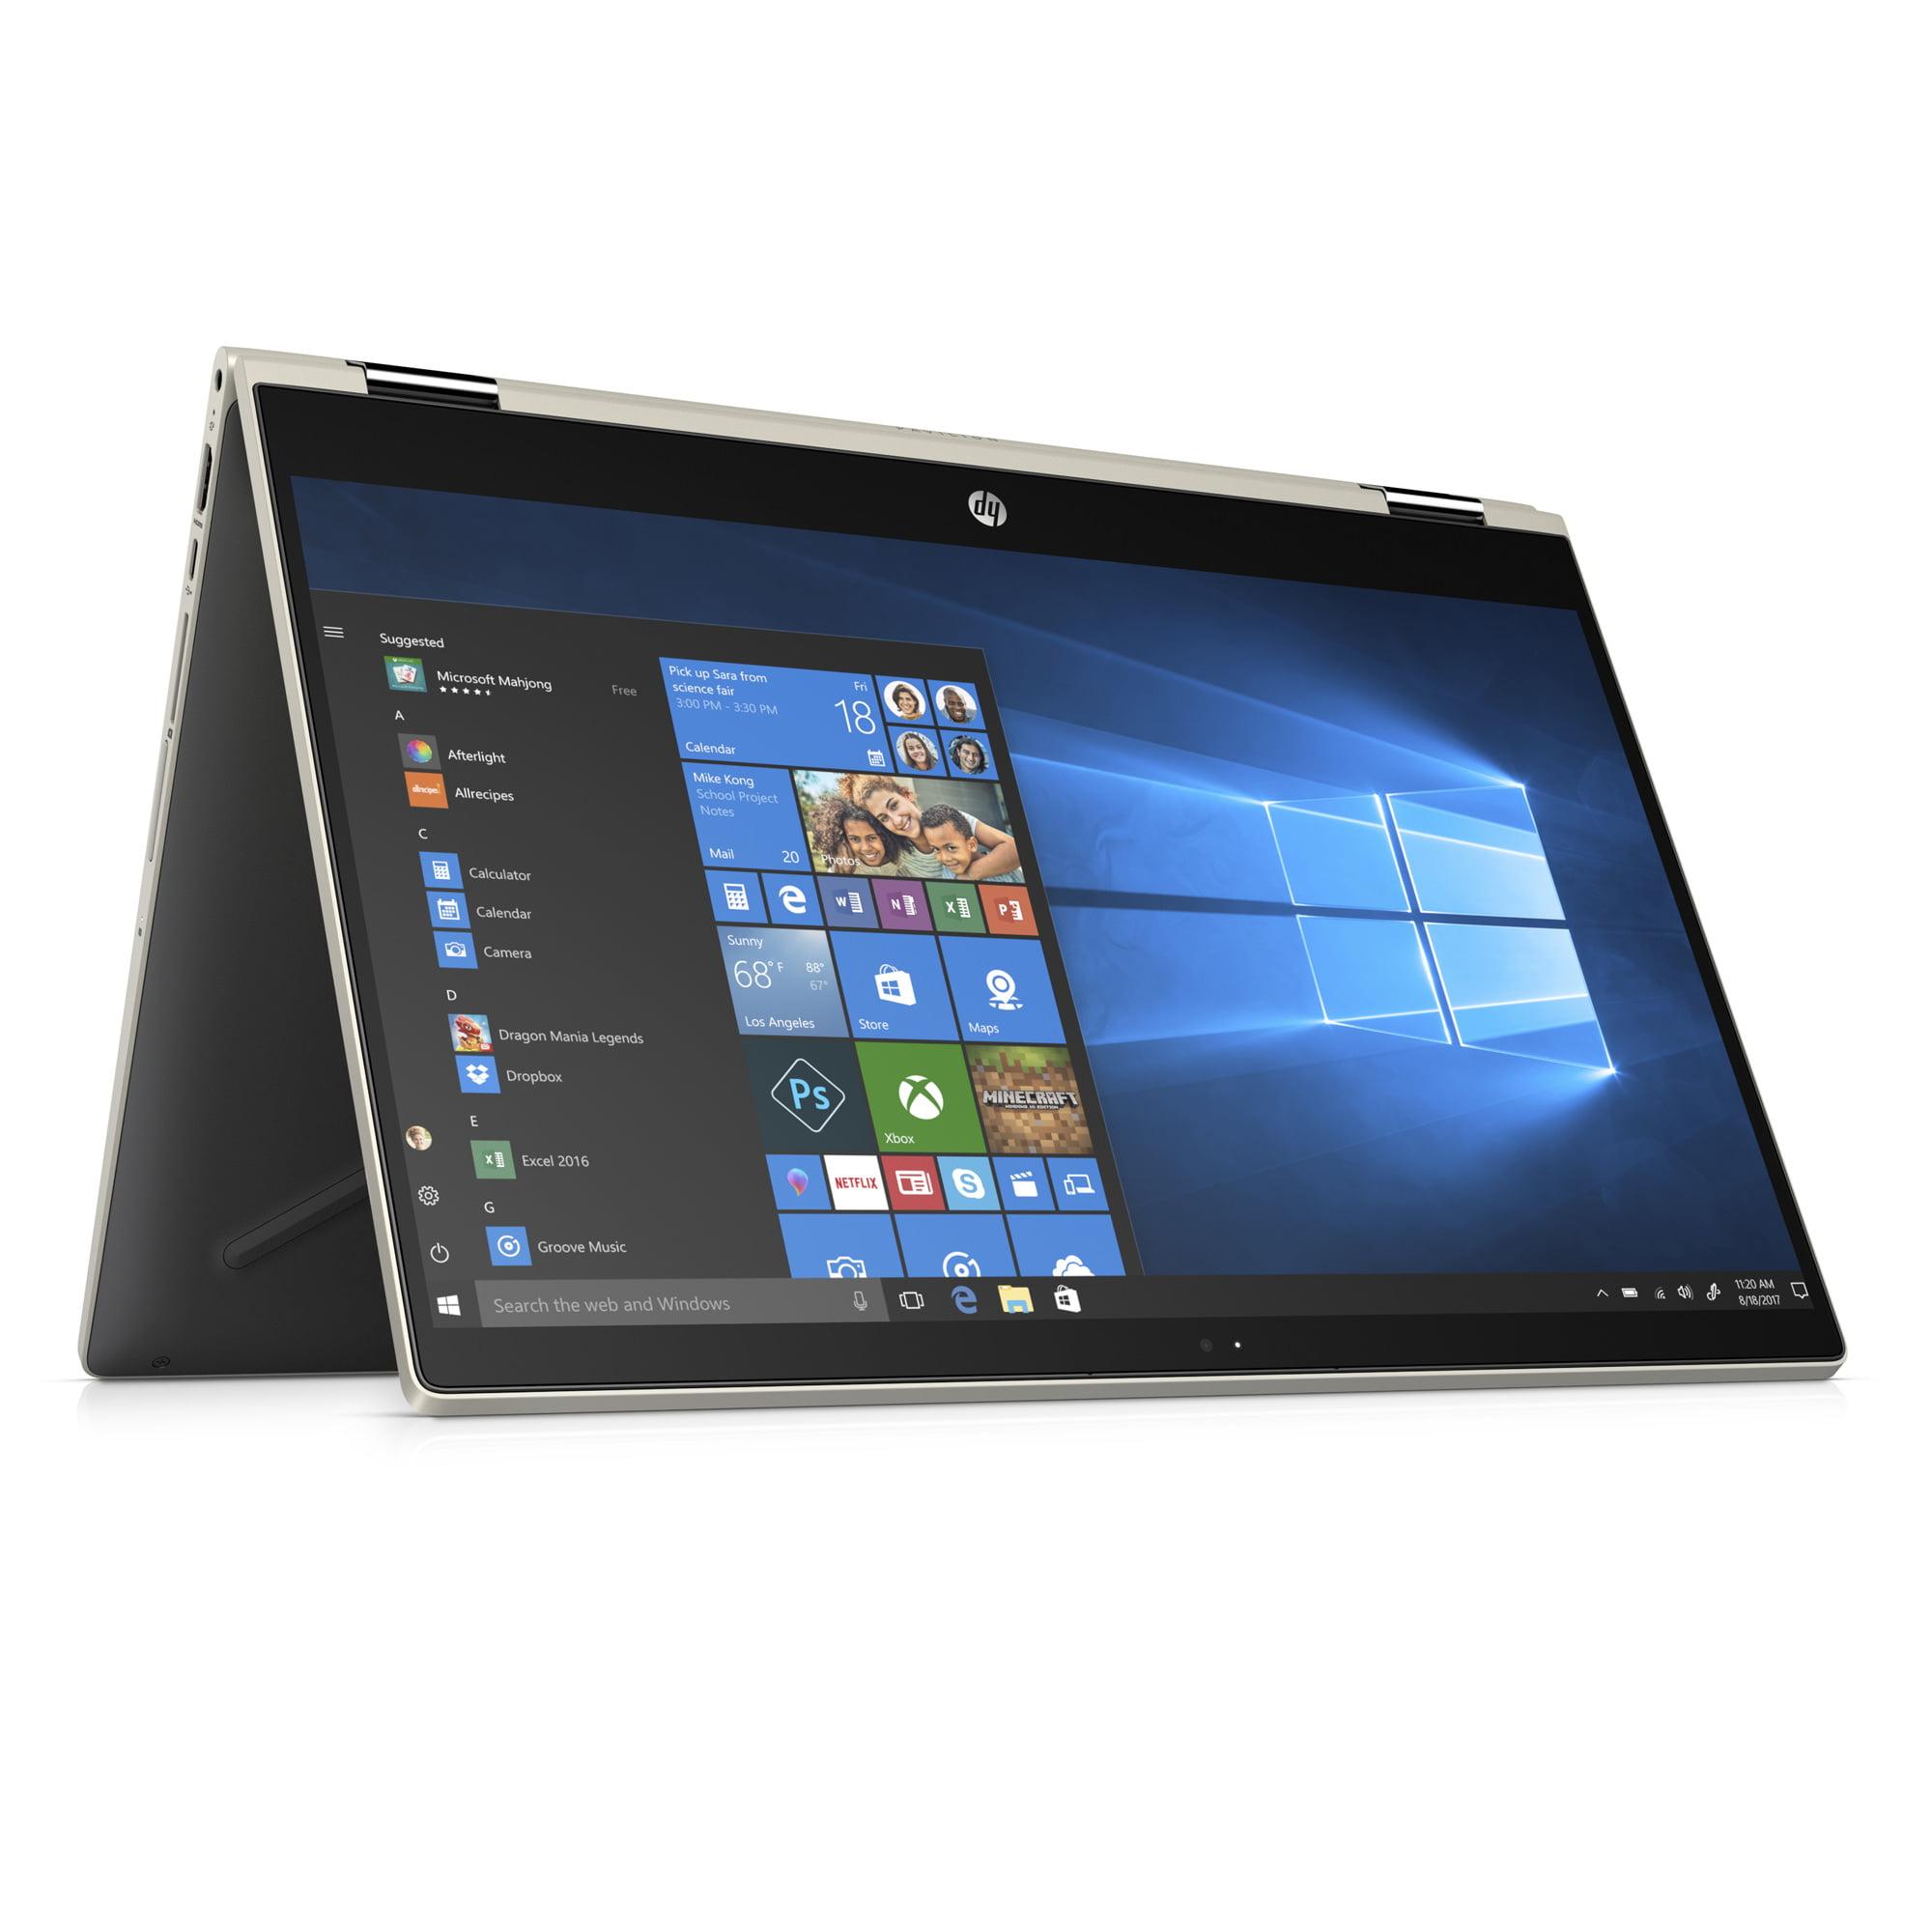 HP Pavilion 15-CR0076NR Pale Gold 15.6 inch Touch Laptop, Windows 10, Core i3-8130U DC Processor, 8GB Memory, 1TB Hard Drive, UMA Graphics, B&O Play